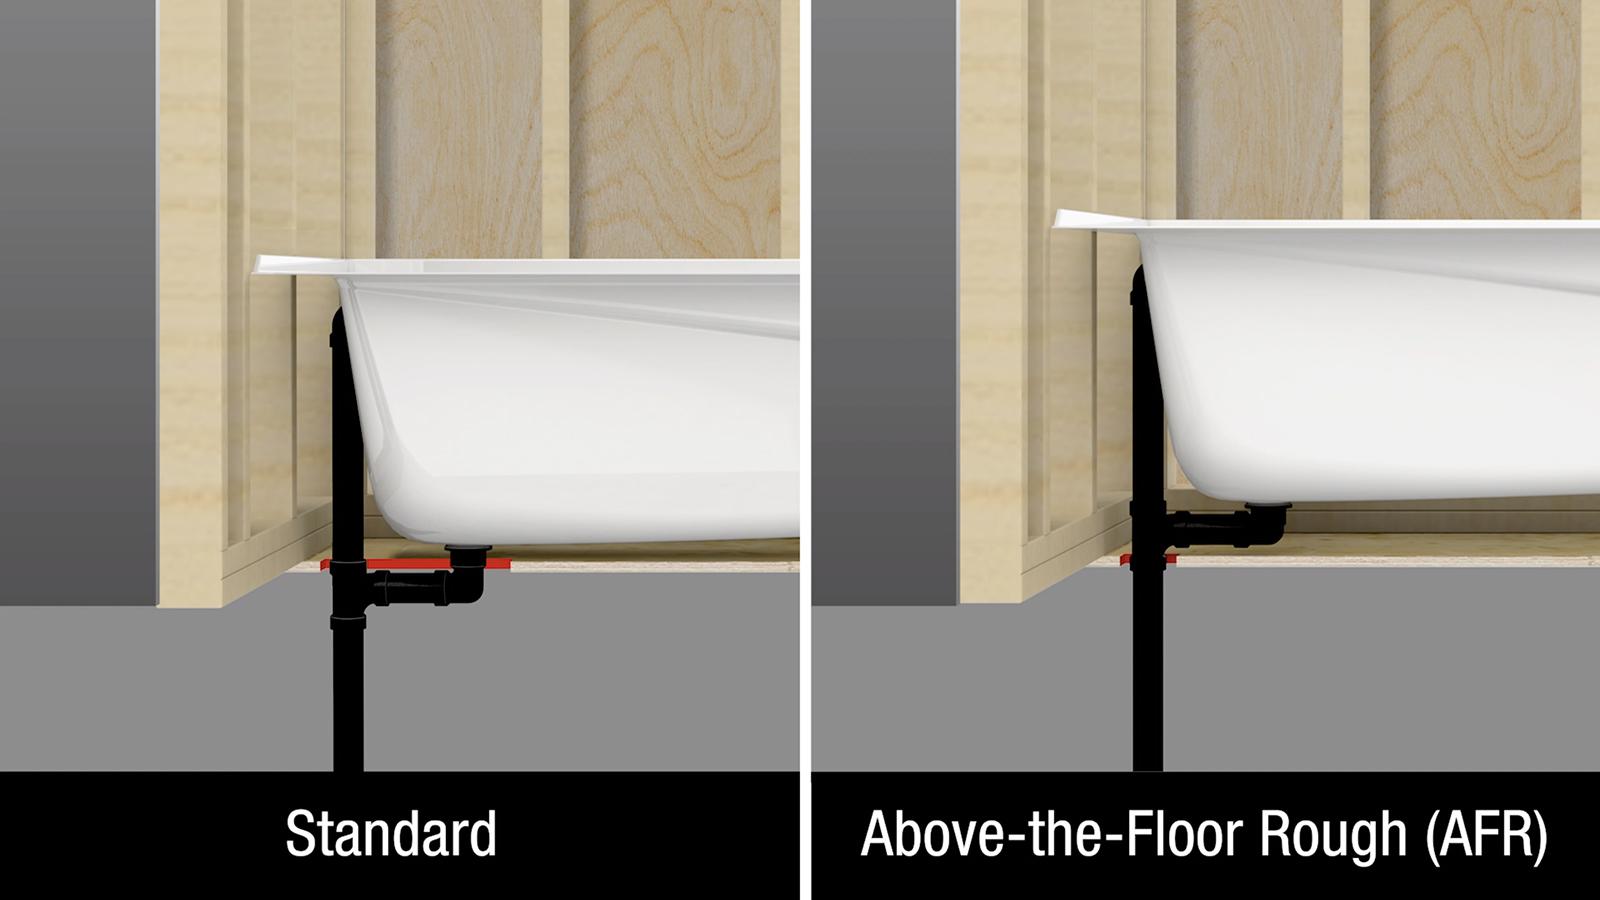 Above-the-Floor Rough (AFR) for bathtubs